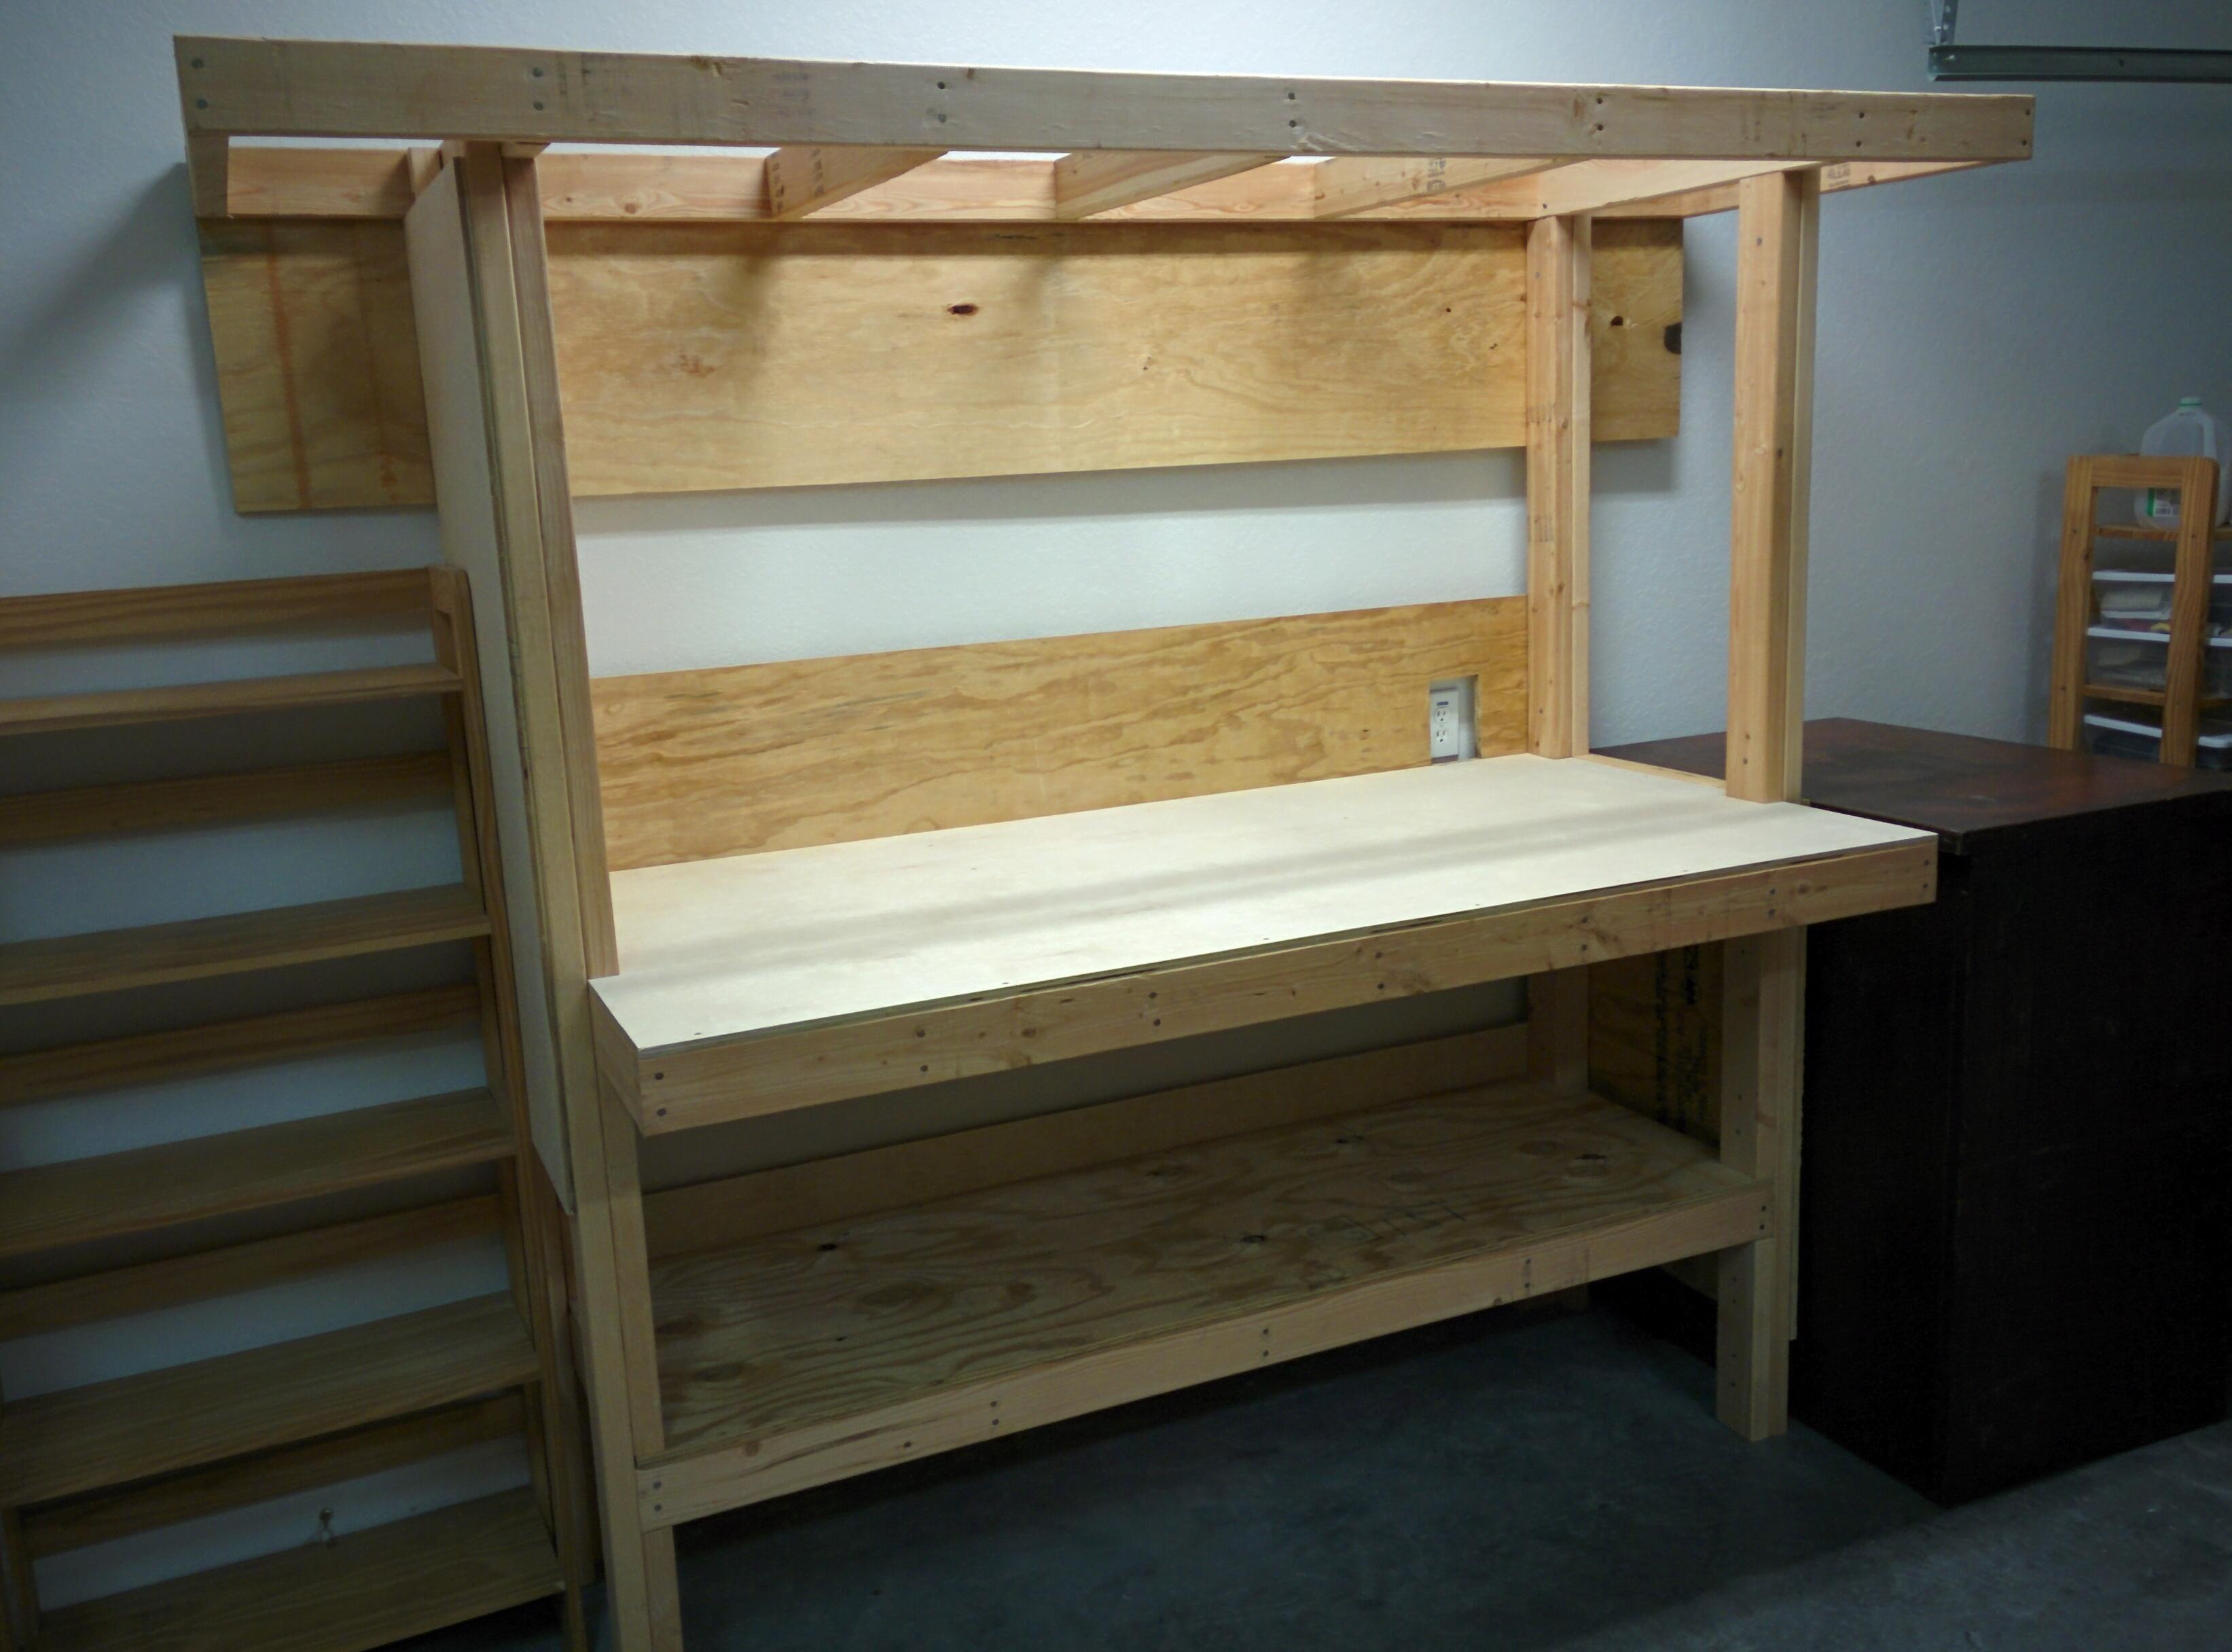 Swell Build A Workbench From Plywood And 24S Jays Technical Talk Creativecarmelina Interior Chair Design Creativecarmelinacom